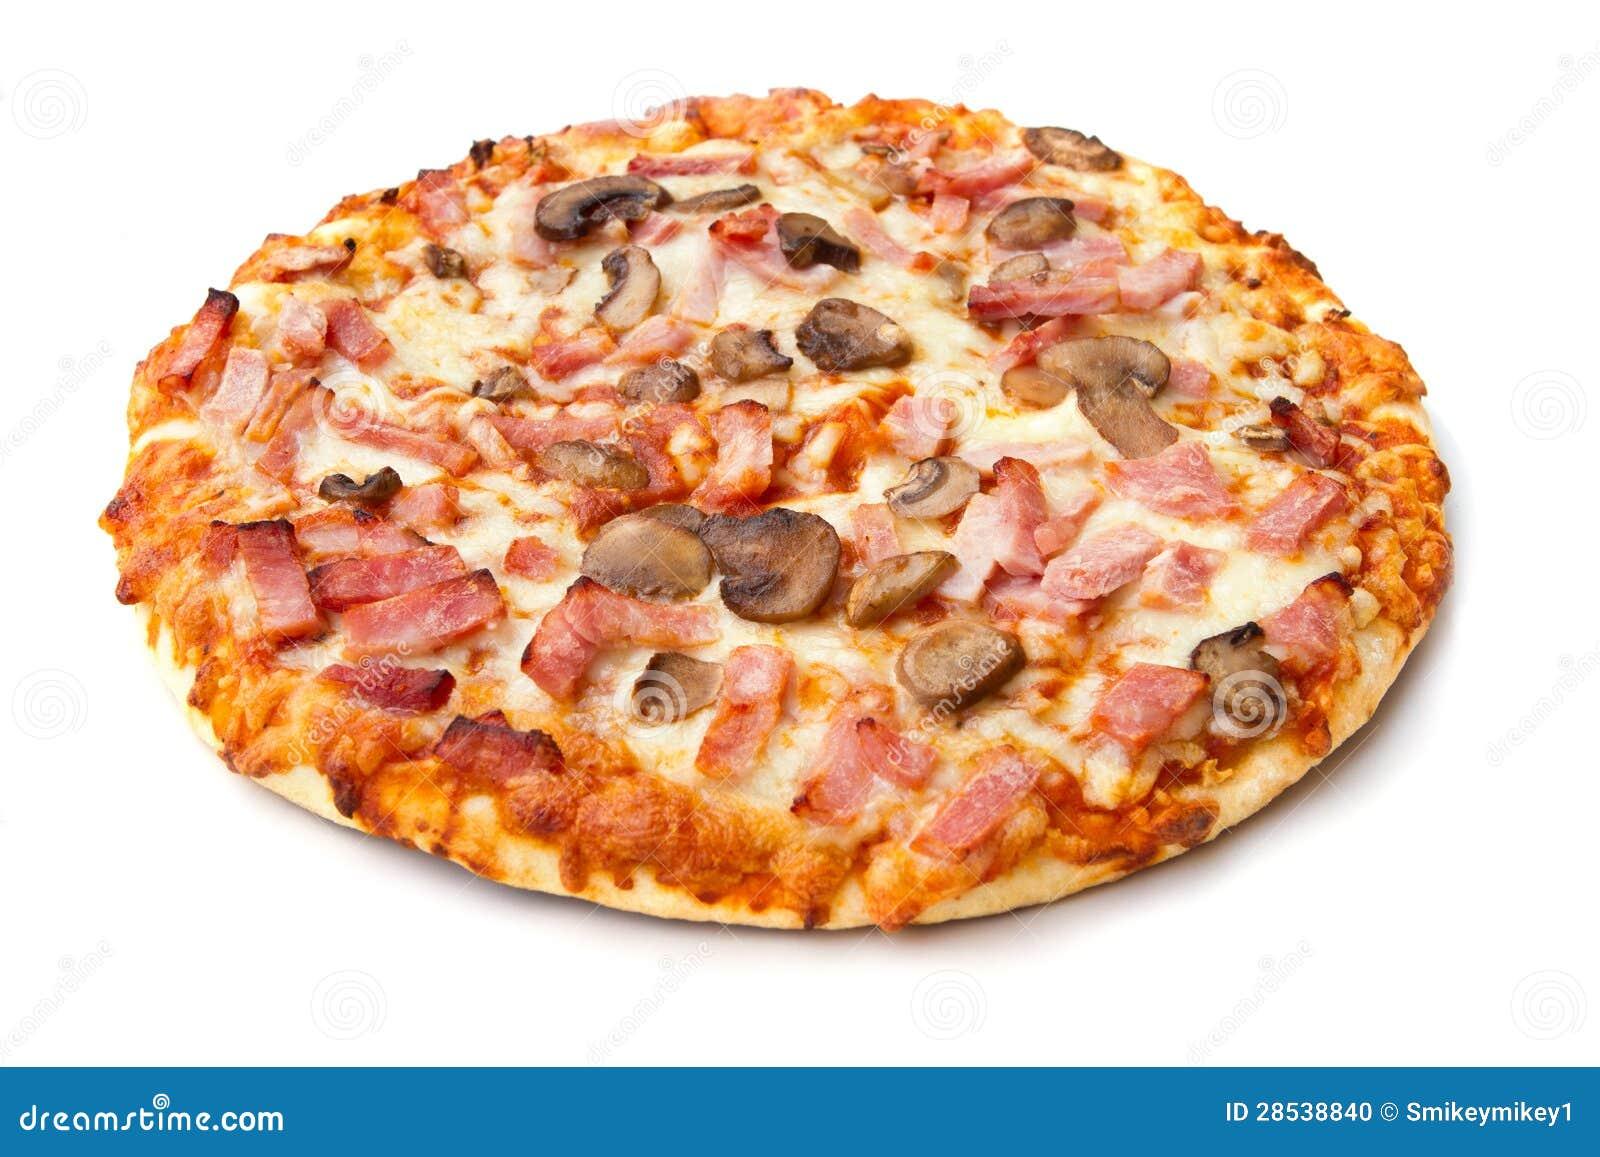 Пицца с салями и грибами рецепт